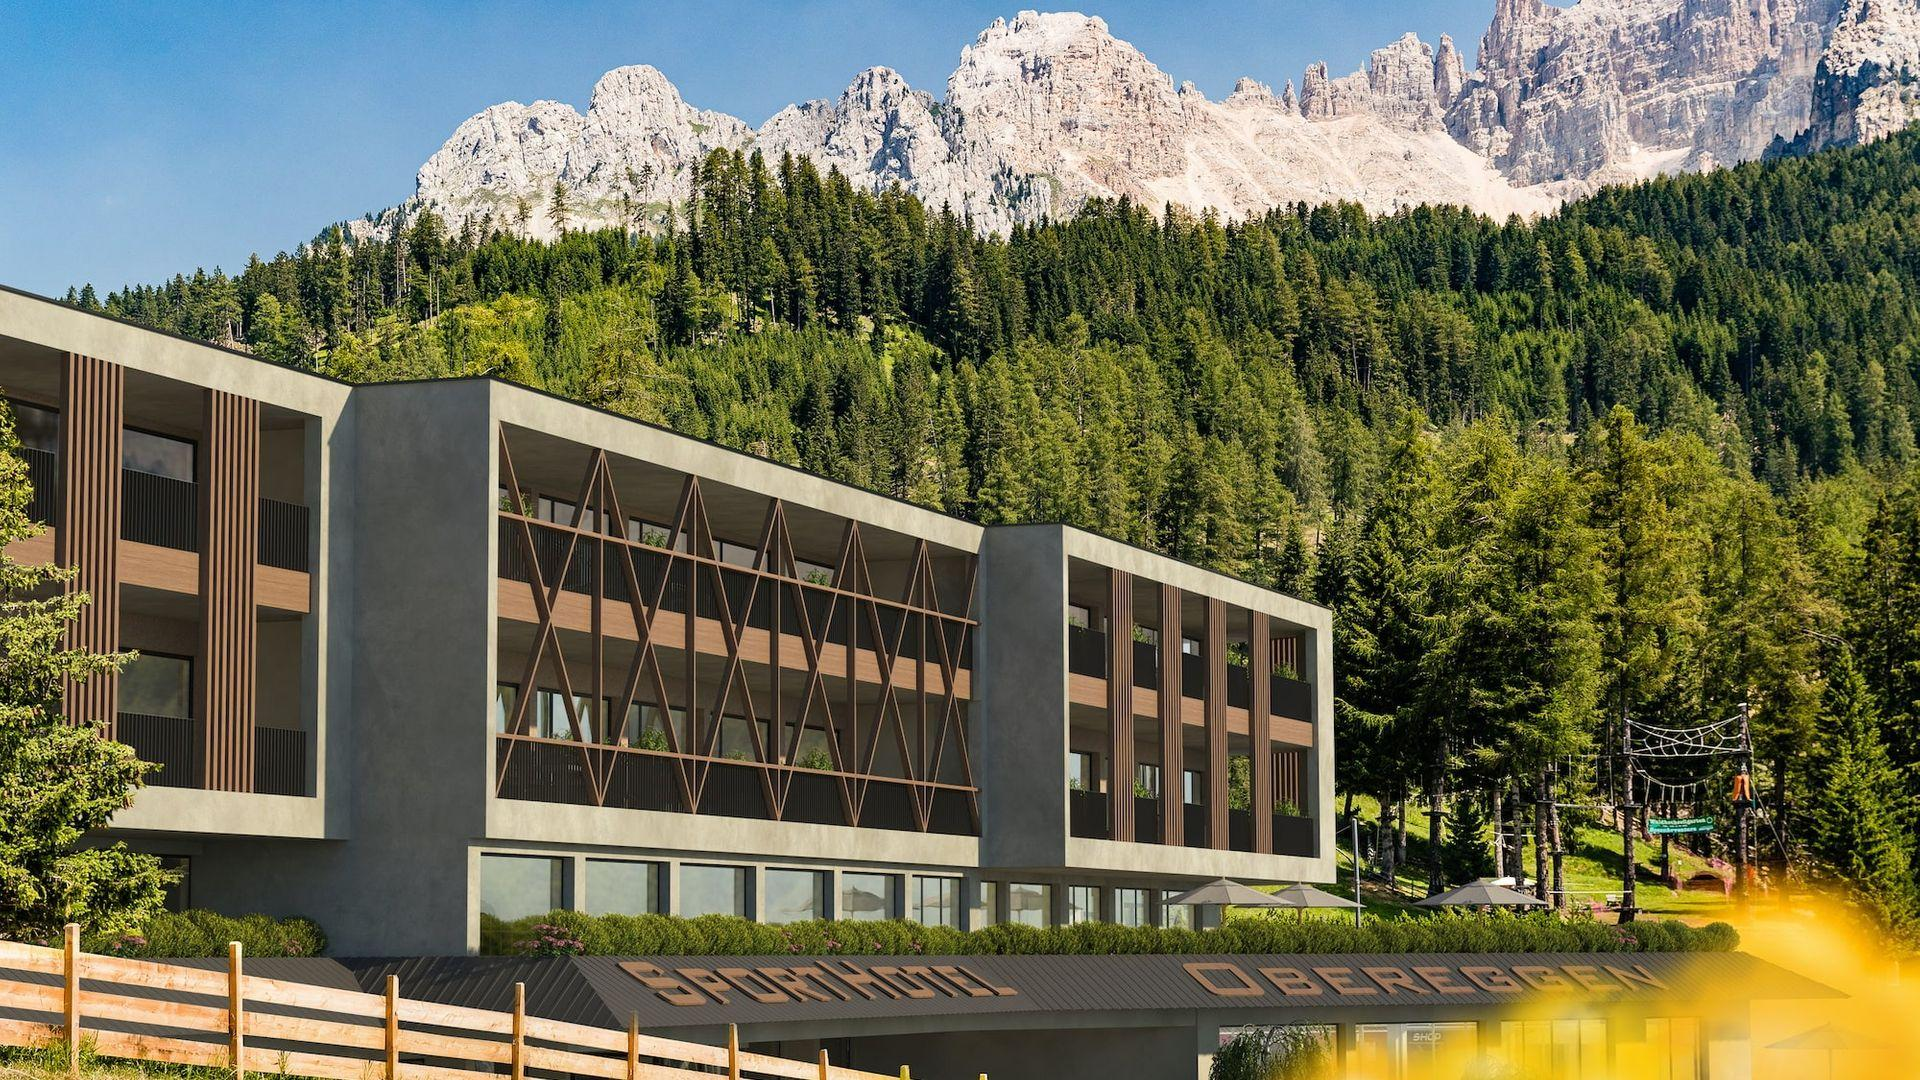 4*S Sporthotel Obereggen